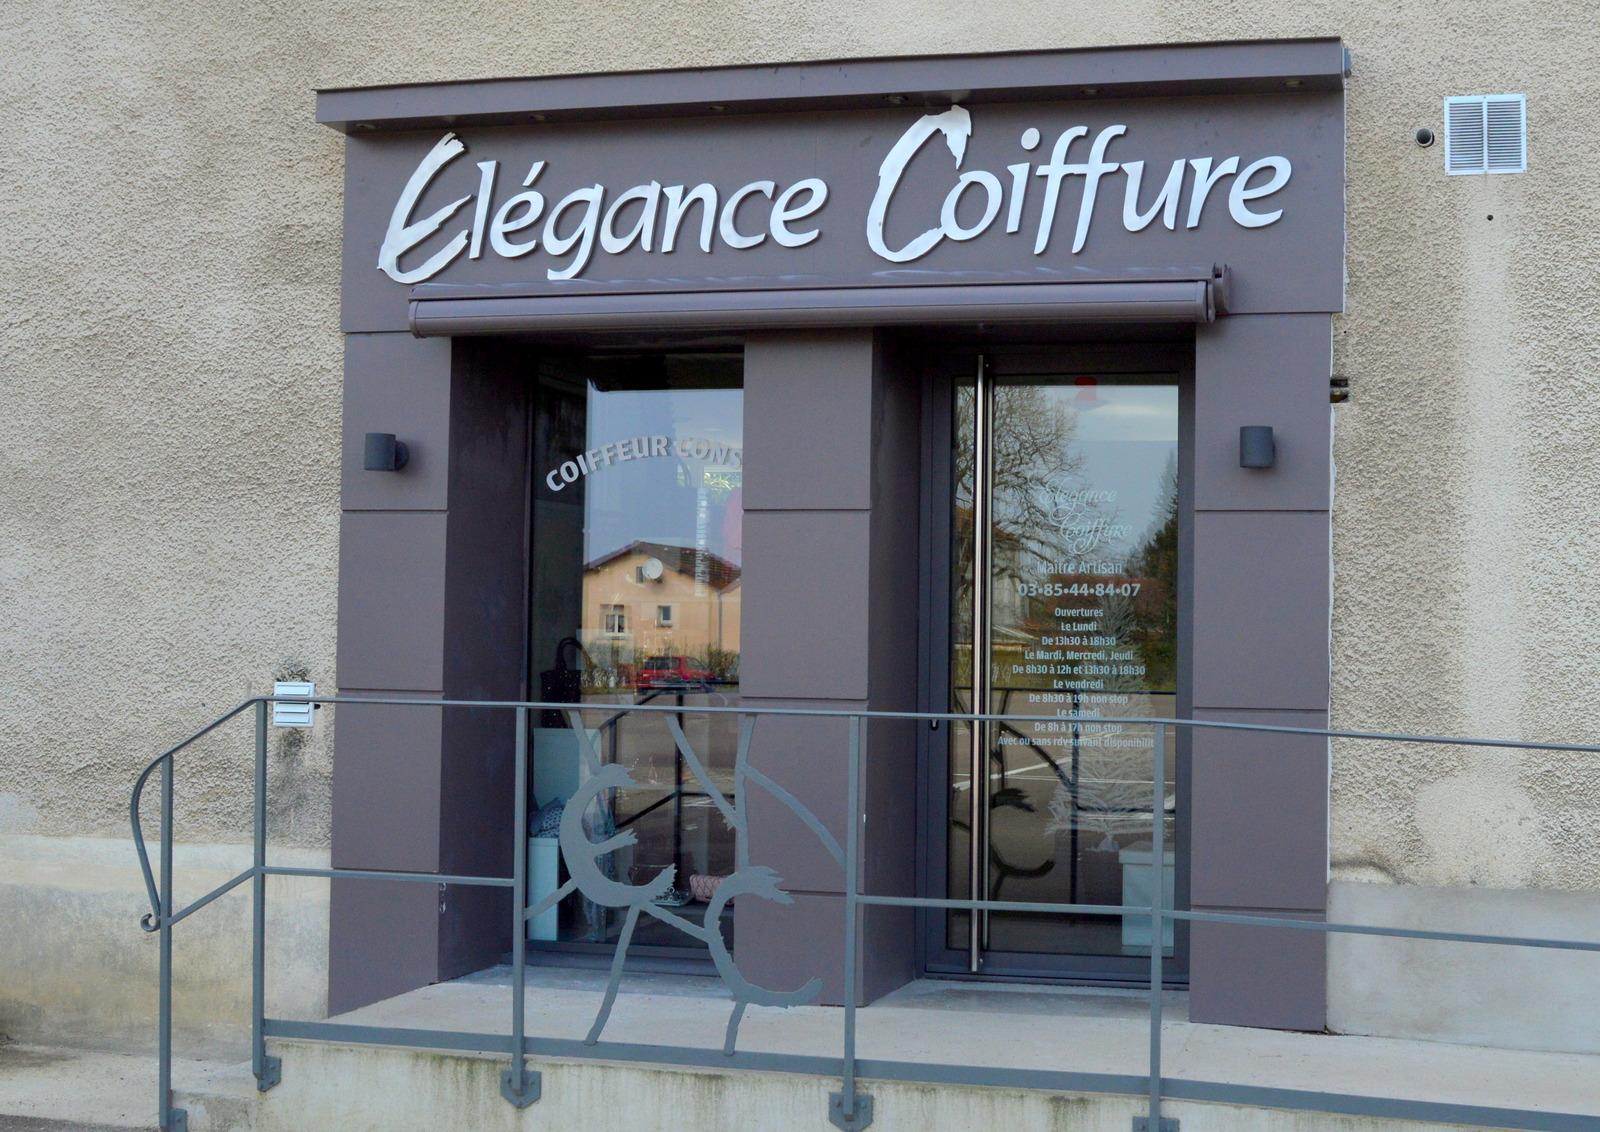 Elegance coiffure new - Elu00e9gance Coiffure